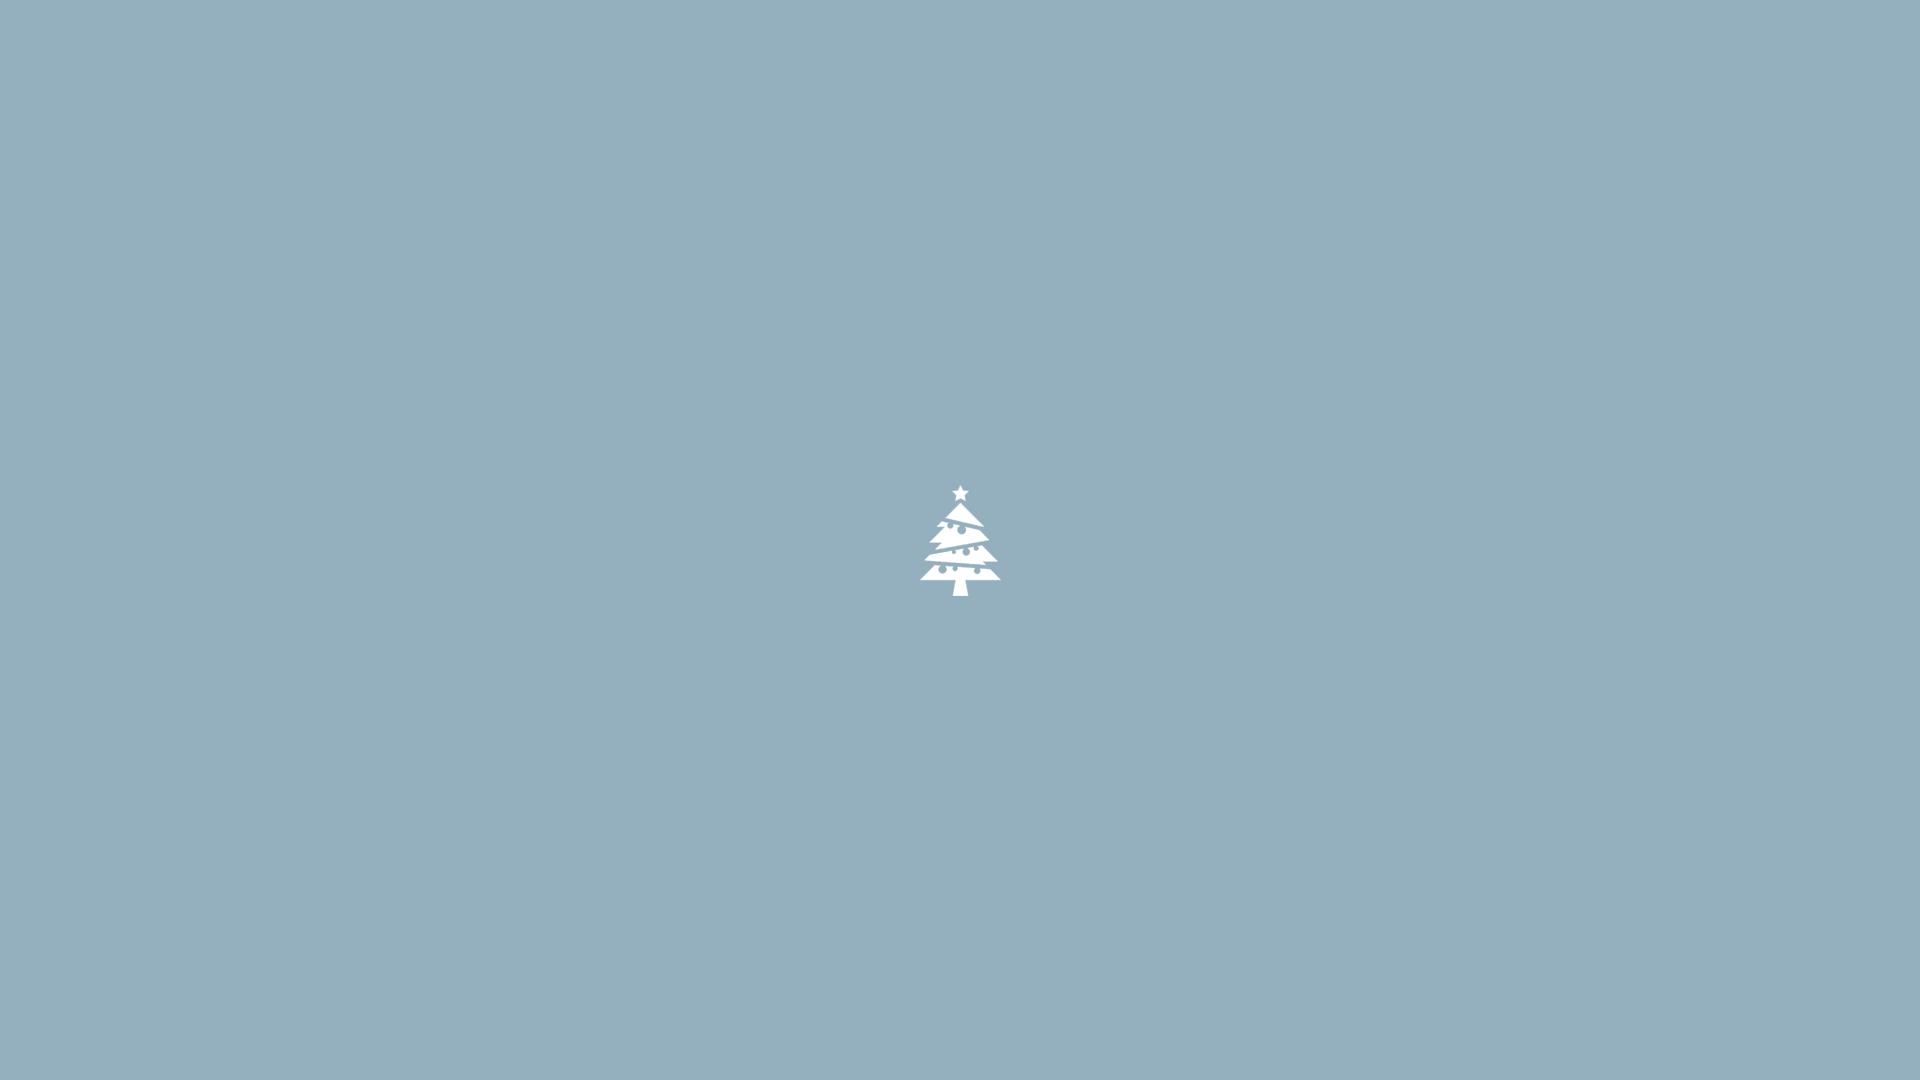 52+ Christmas Minimalist Wallpapers on WallpaperSafari